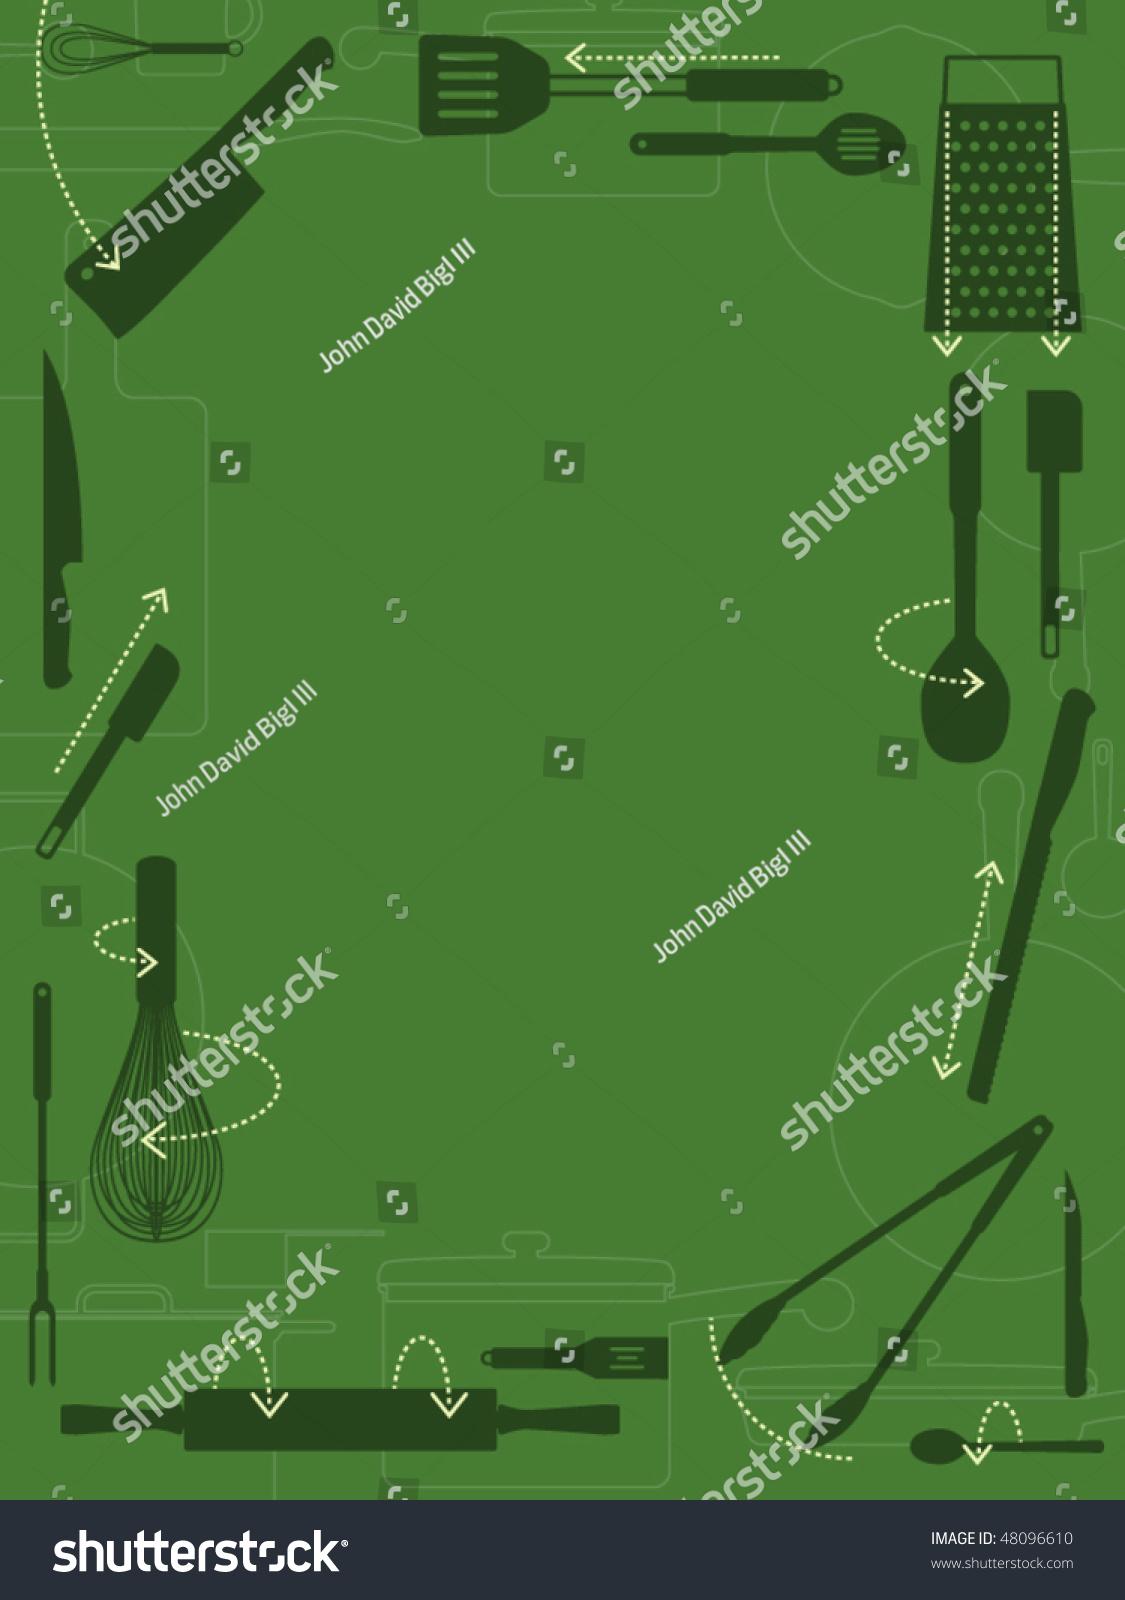 Kitchen Utensils Border kitchen utensils with directional arrows decorative border stock